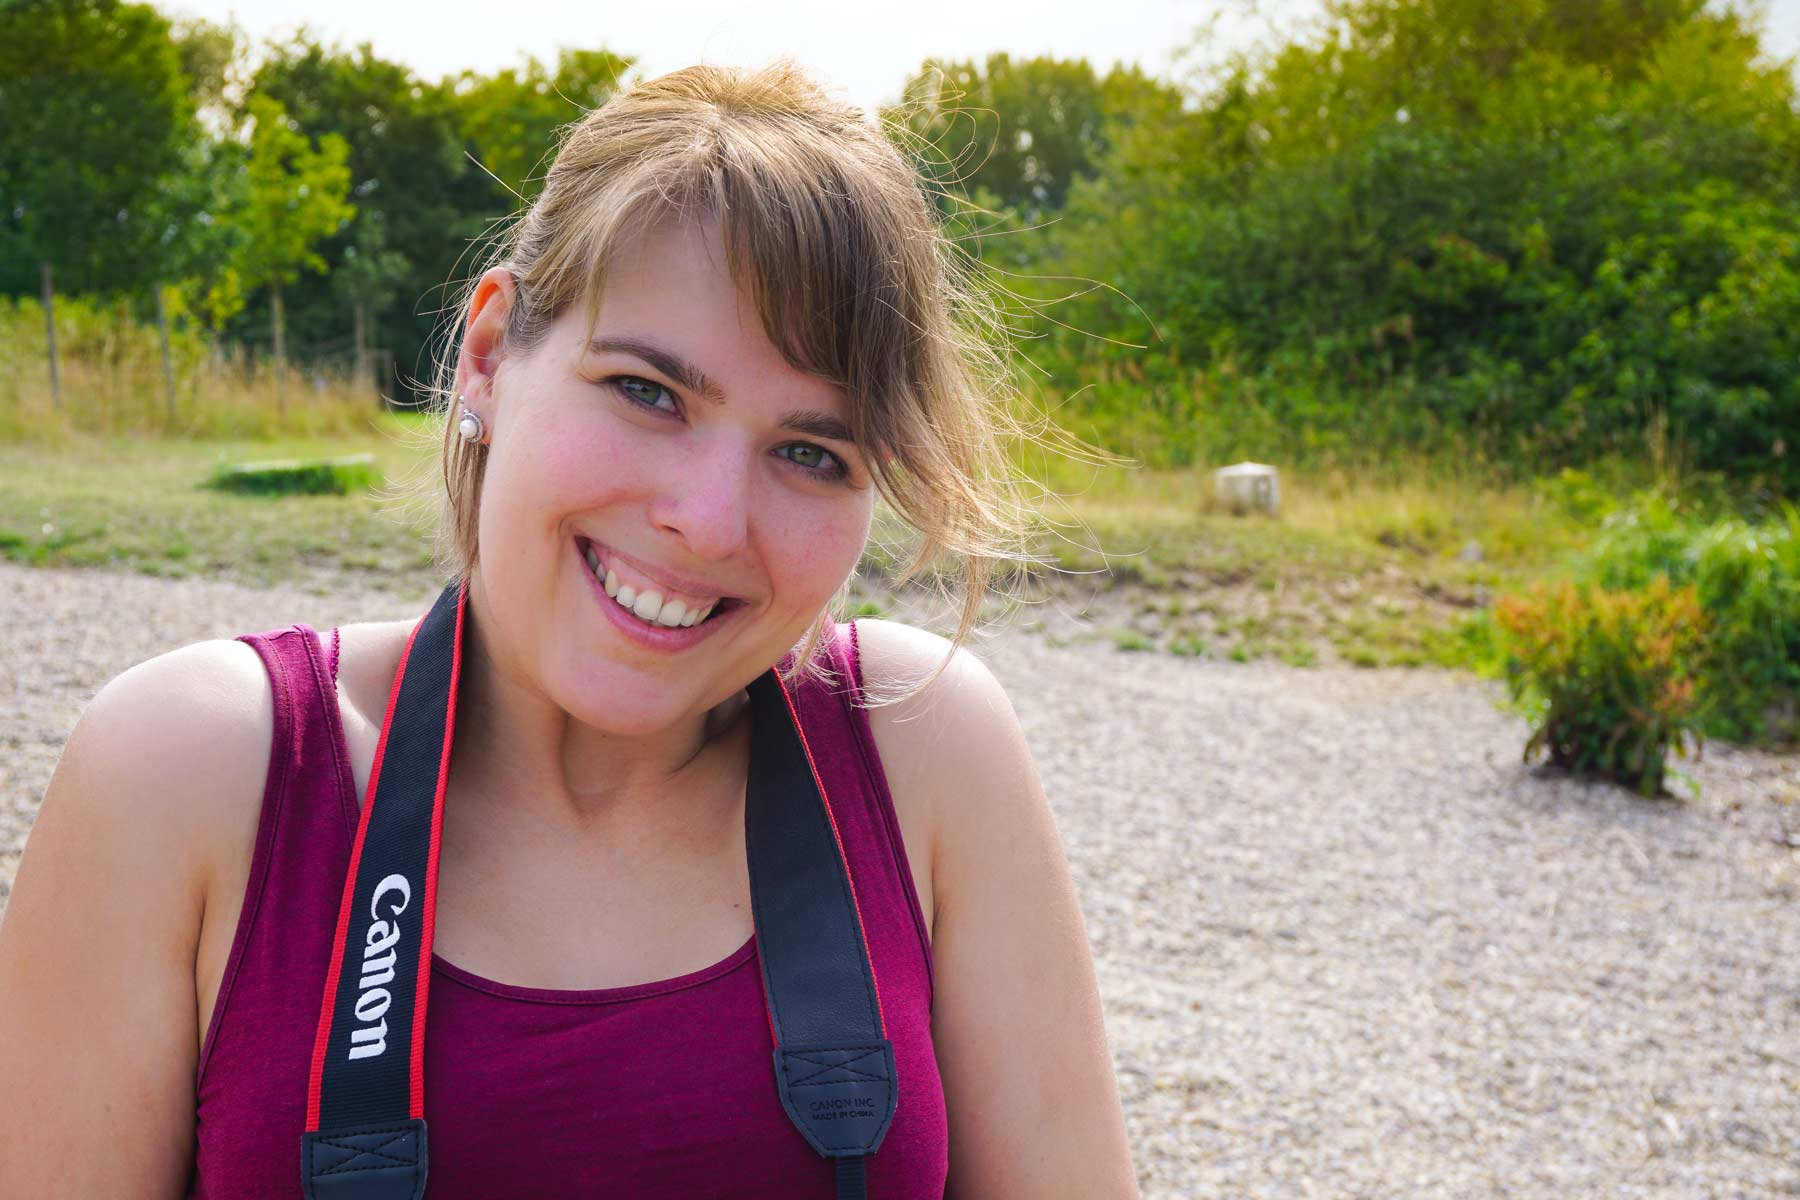 Photowalk zu Kameratechnik und Portraits DSC00559-3w